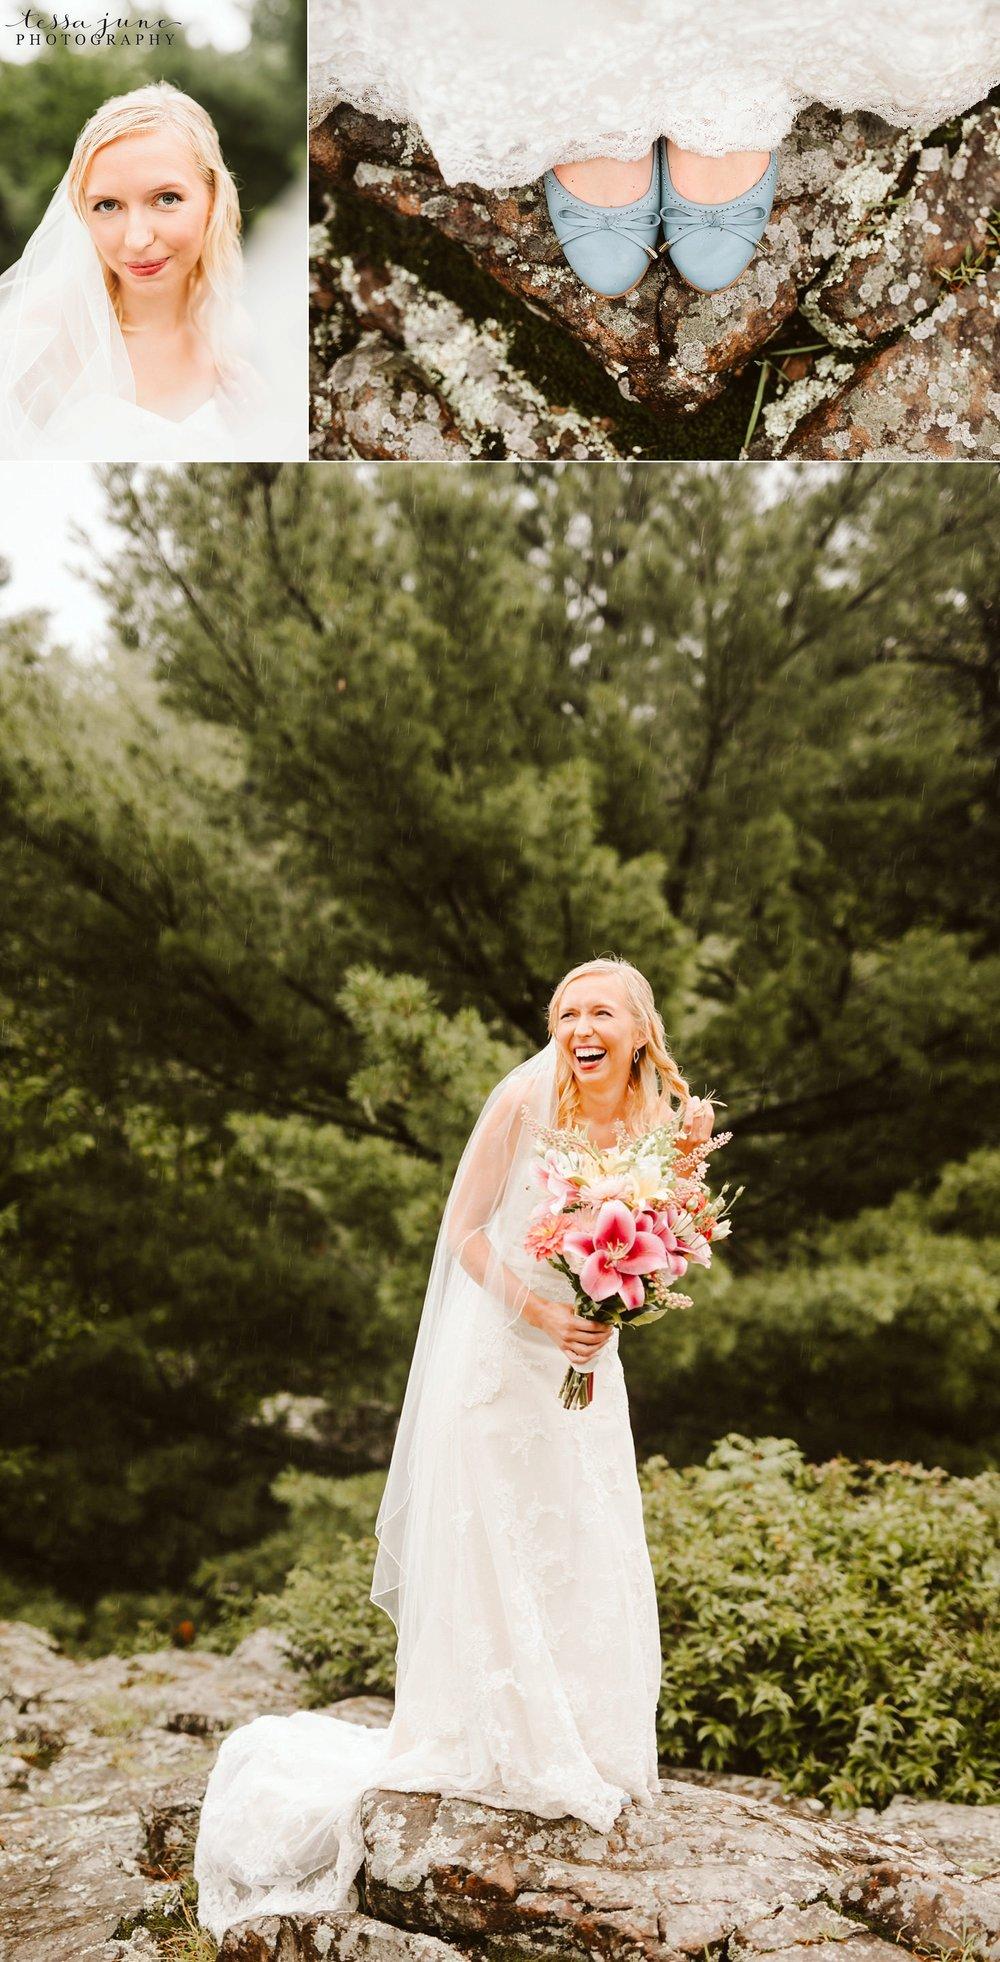 taylors-falls-rainy-elopement-wedding-interstate-state-park-27.jpg